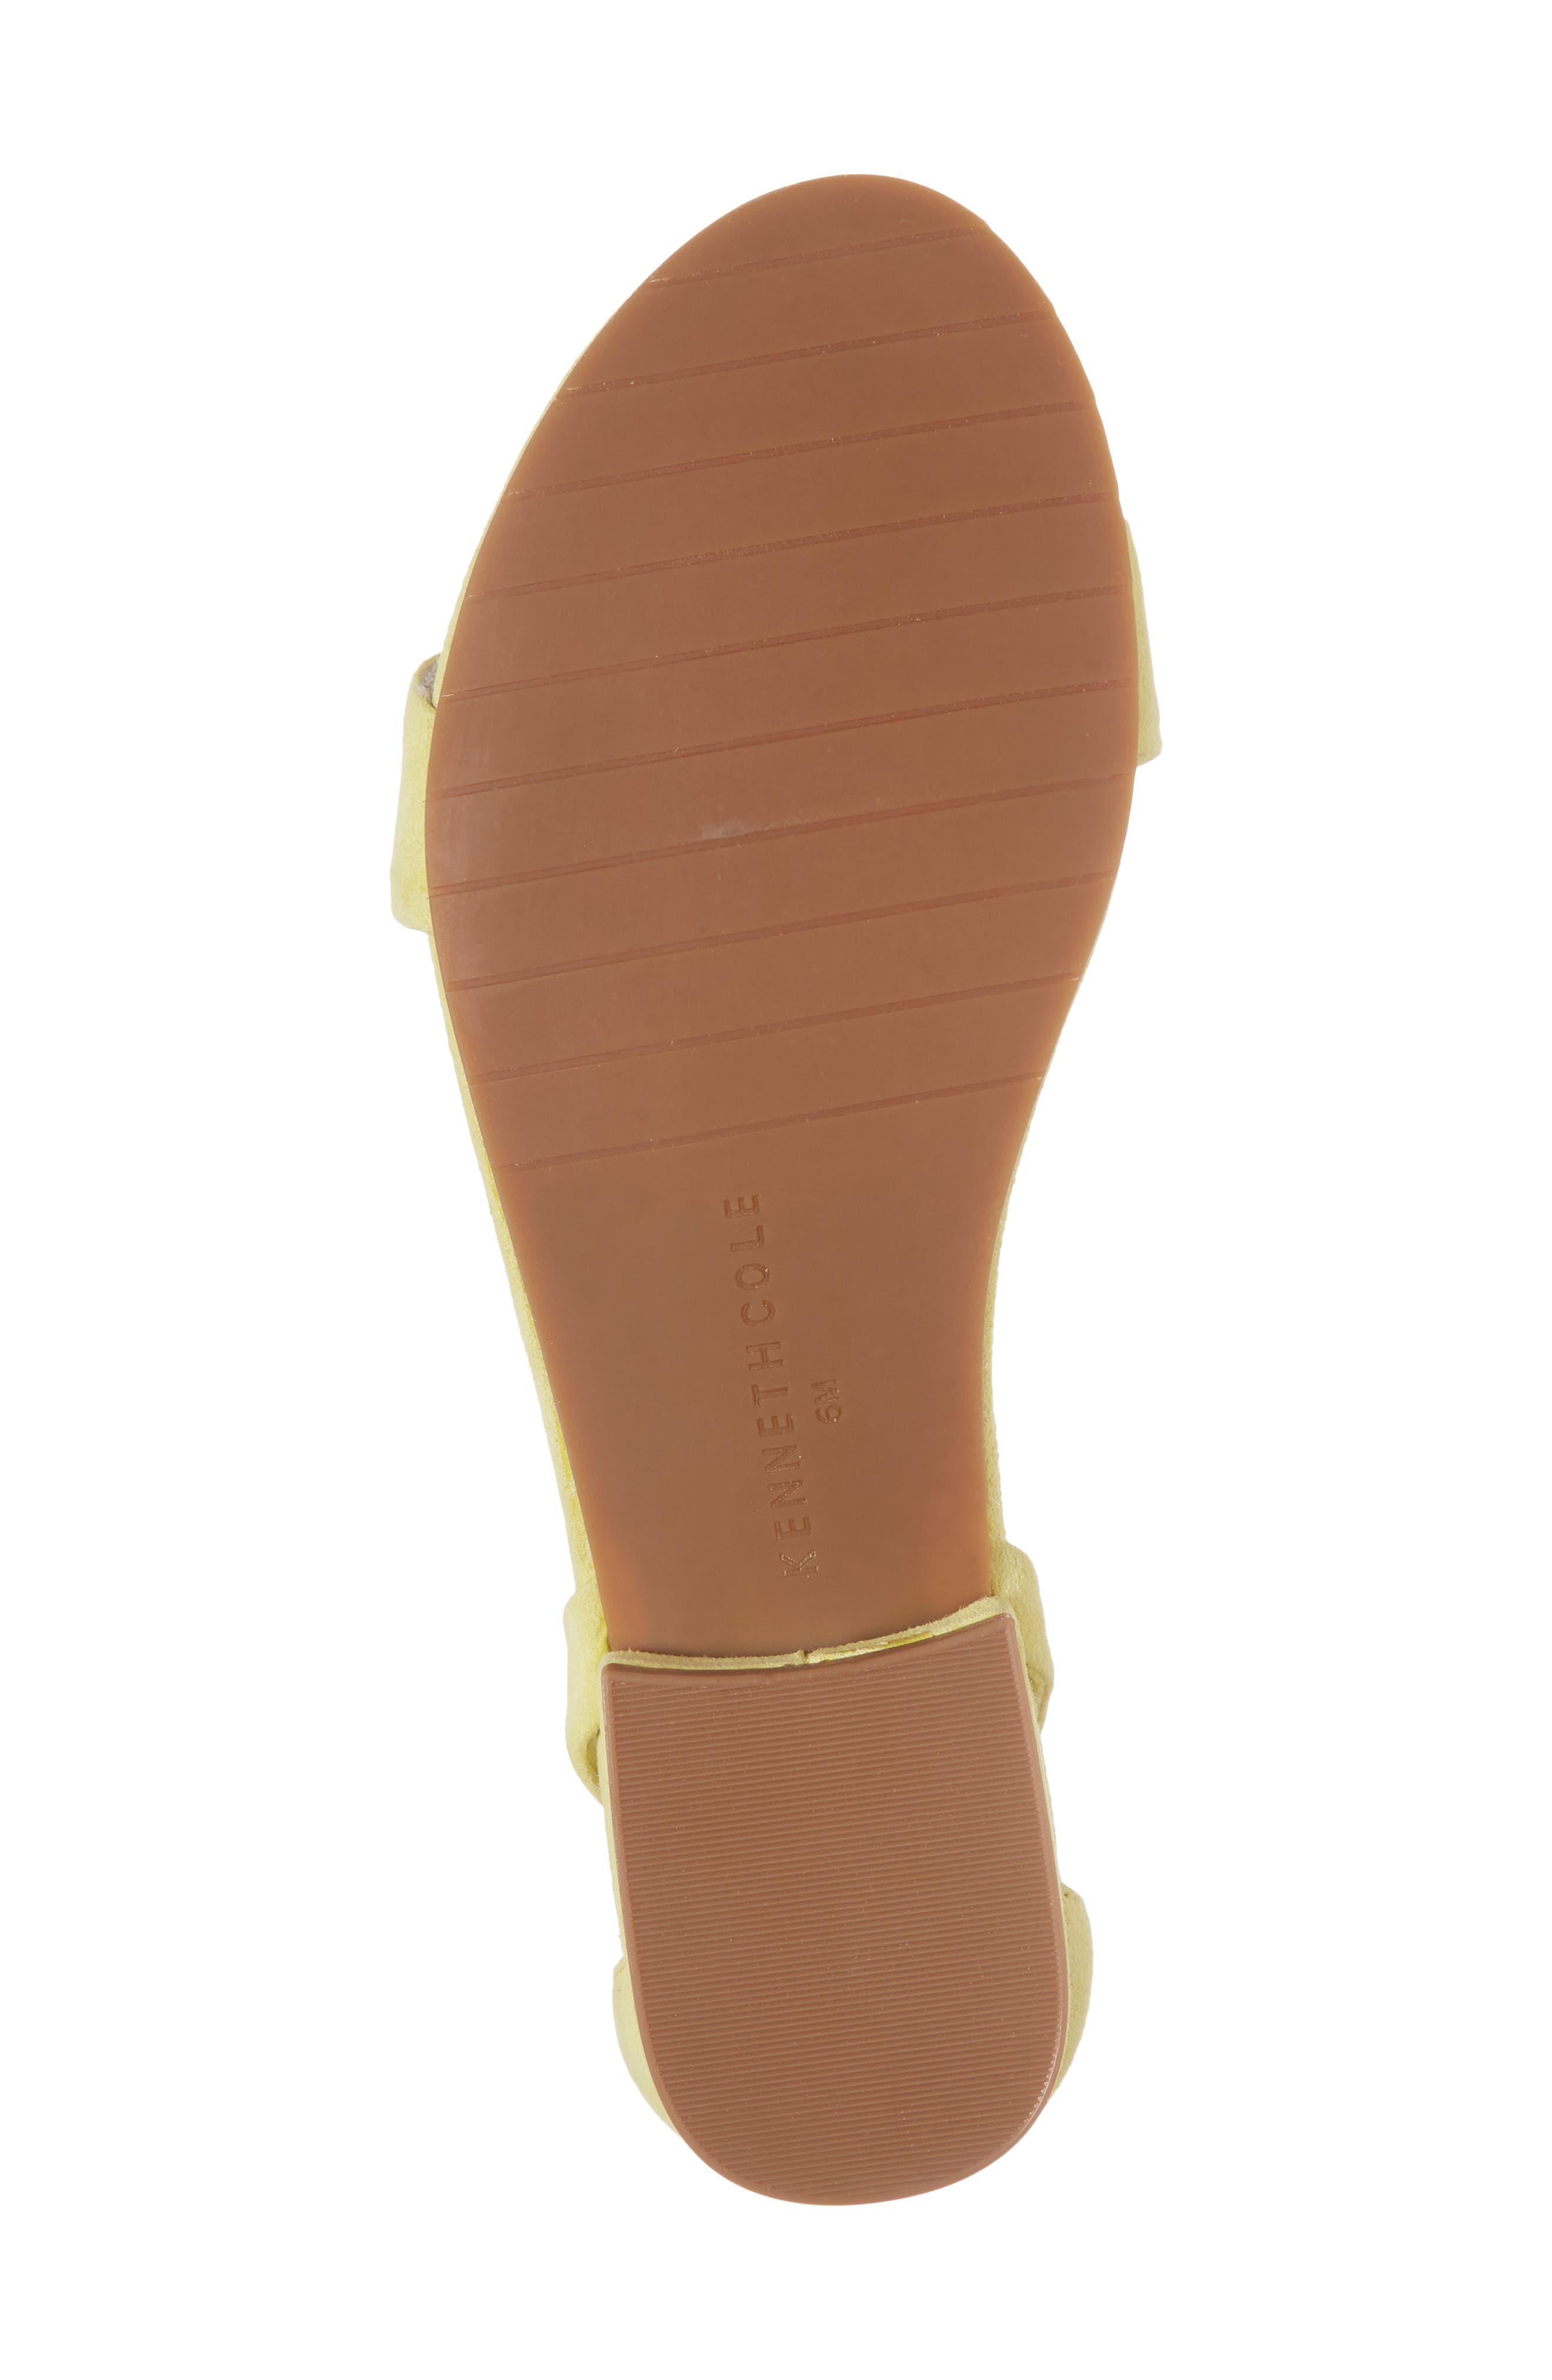 Valen Tassel Lace-Up Sandal,                             Alternate thumbnail 71, color,